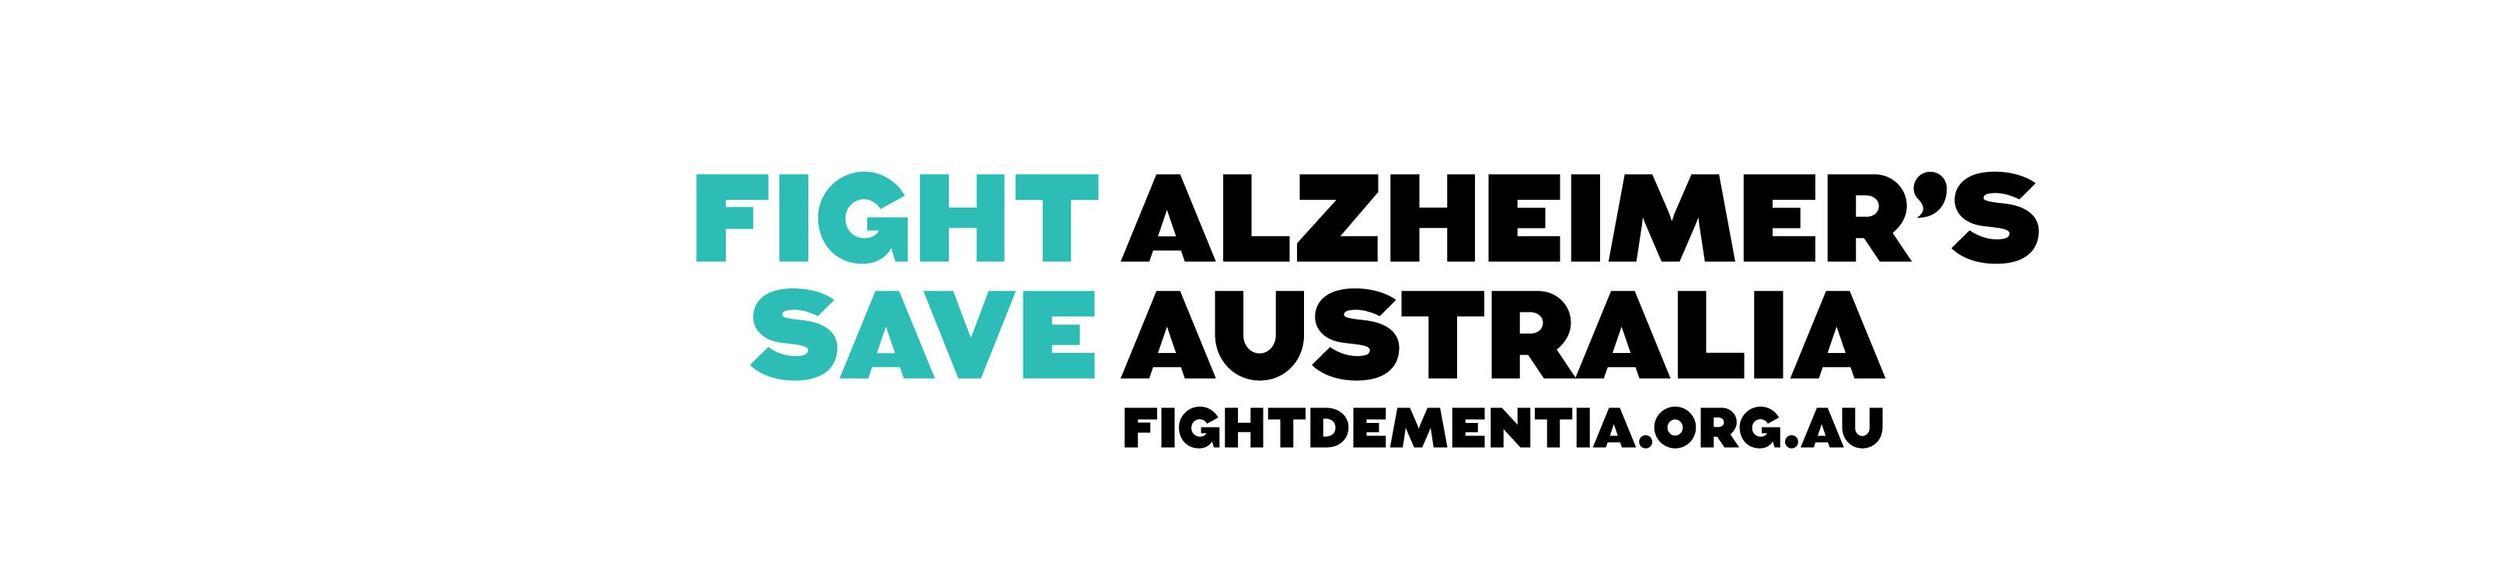 Alzheimers Australia.jpg